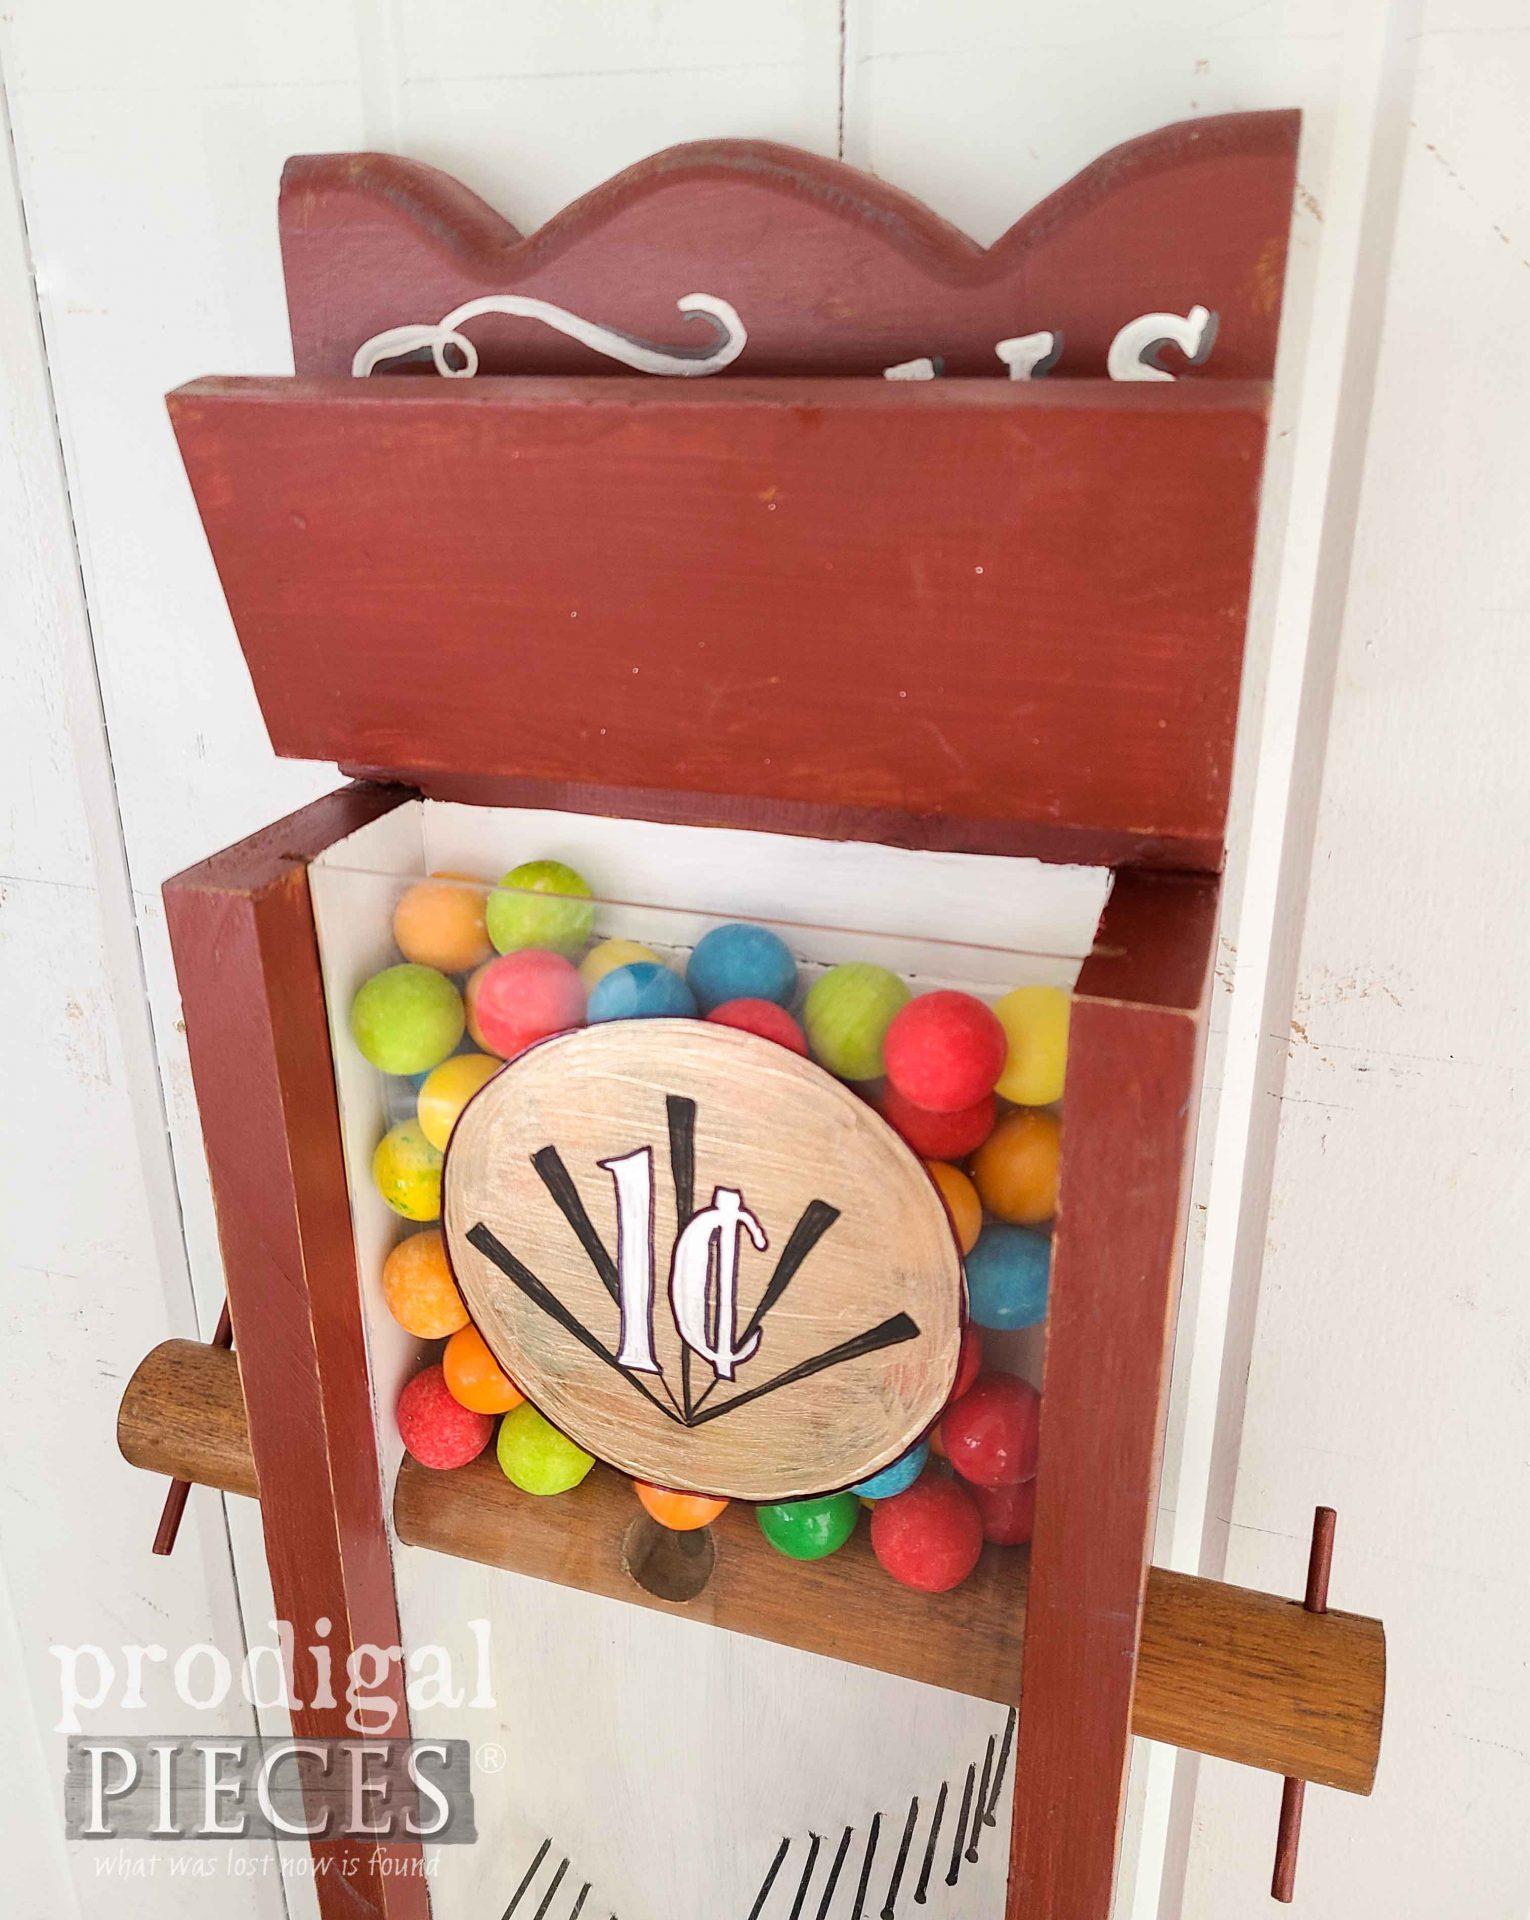 Filling Gumball Machine with Yum | prodigalpieces.com #prodigalpieces #vintage #handmade #vintage